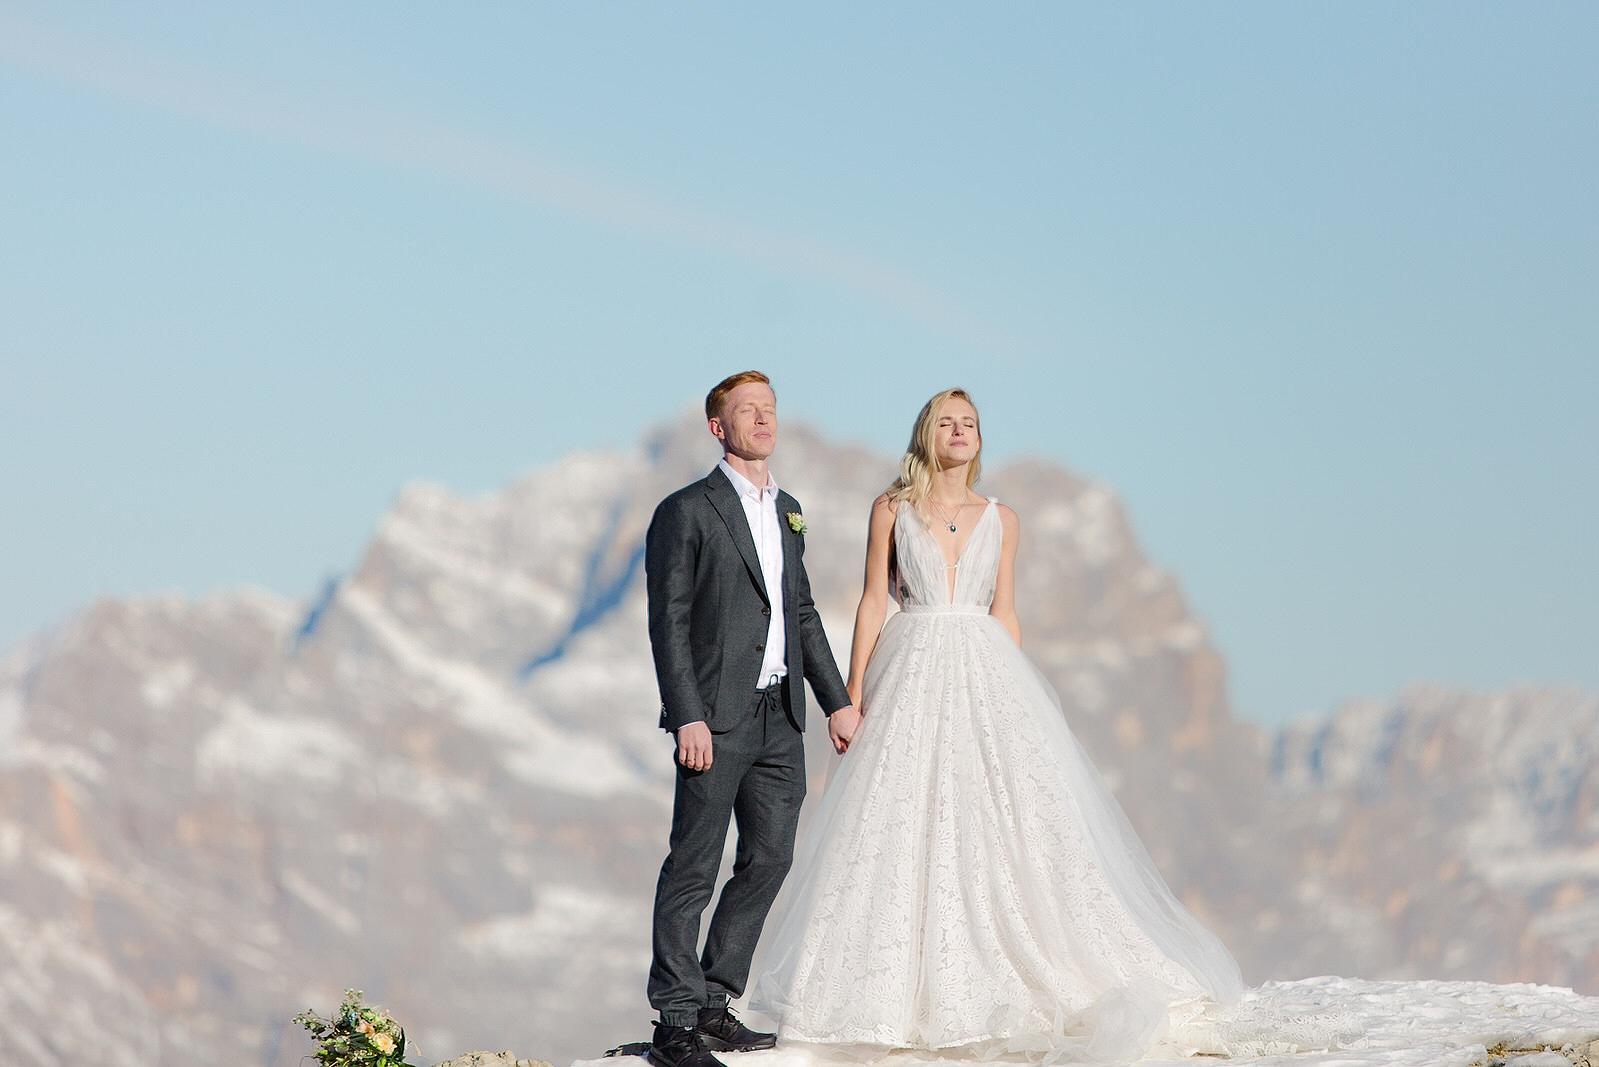 Adventurous+Dolomites+Elopement+Wedding+Fotomagoria35.jpg